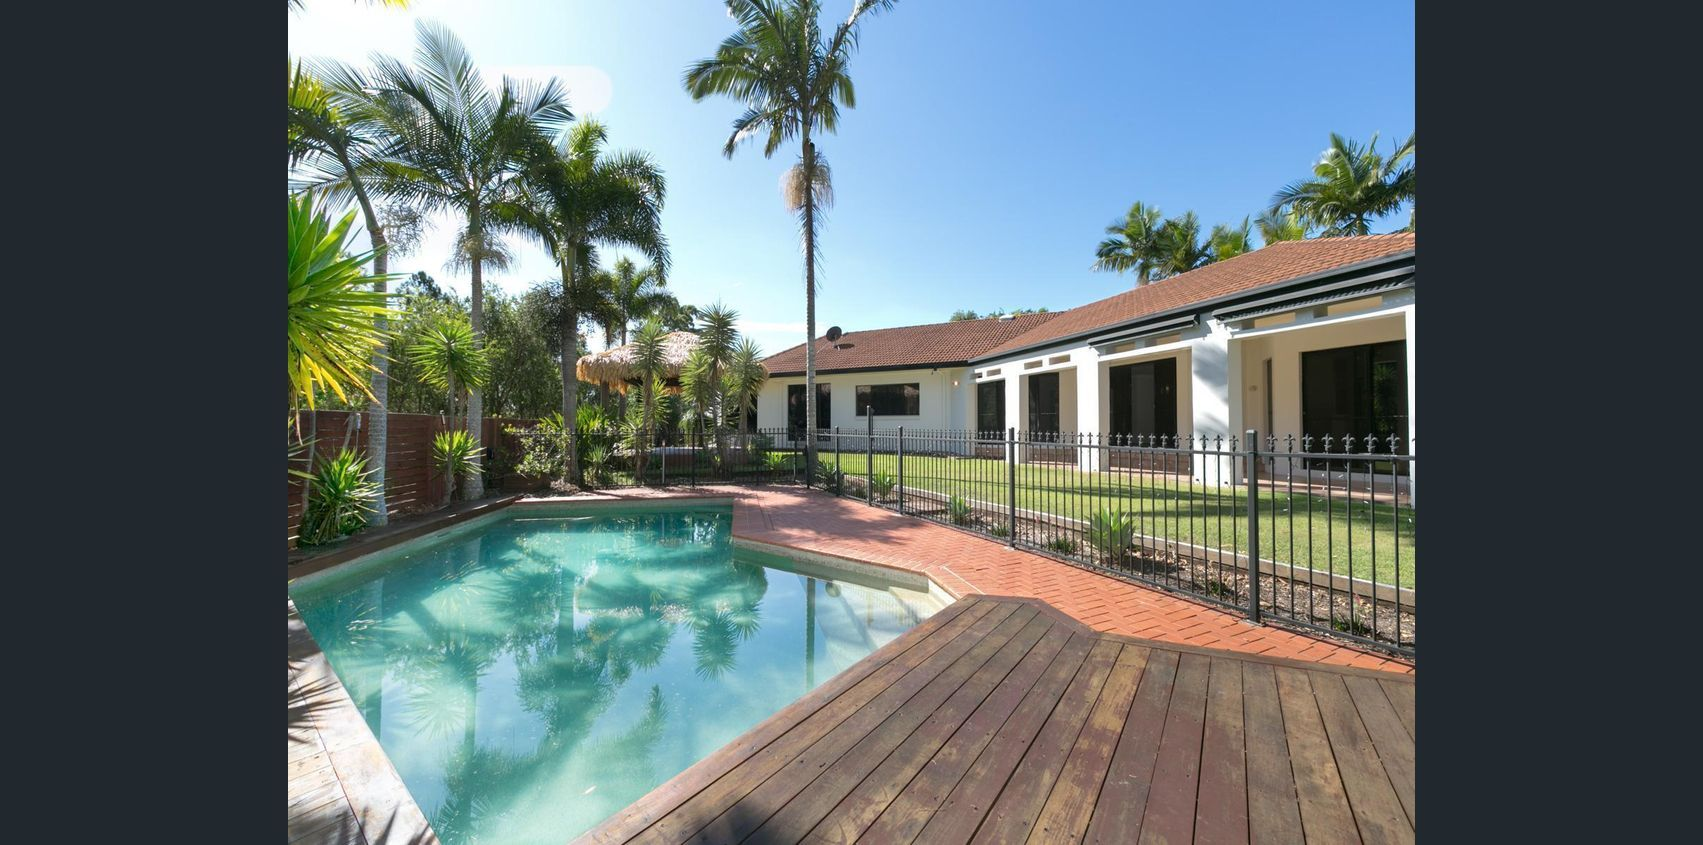 29 Courcheval Terrace, Mons QLD 4556, Image 0